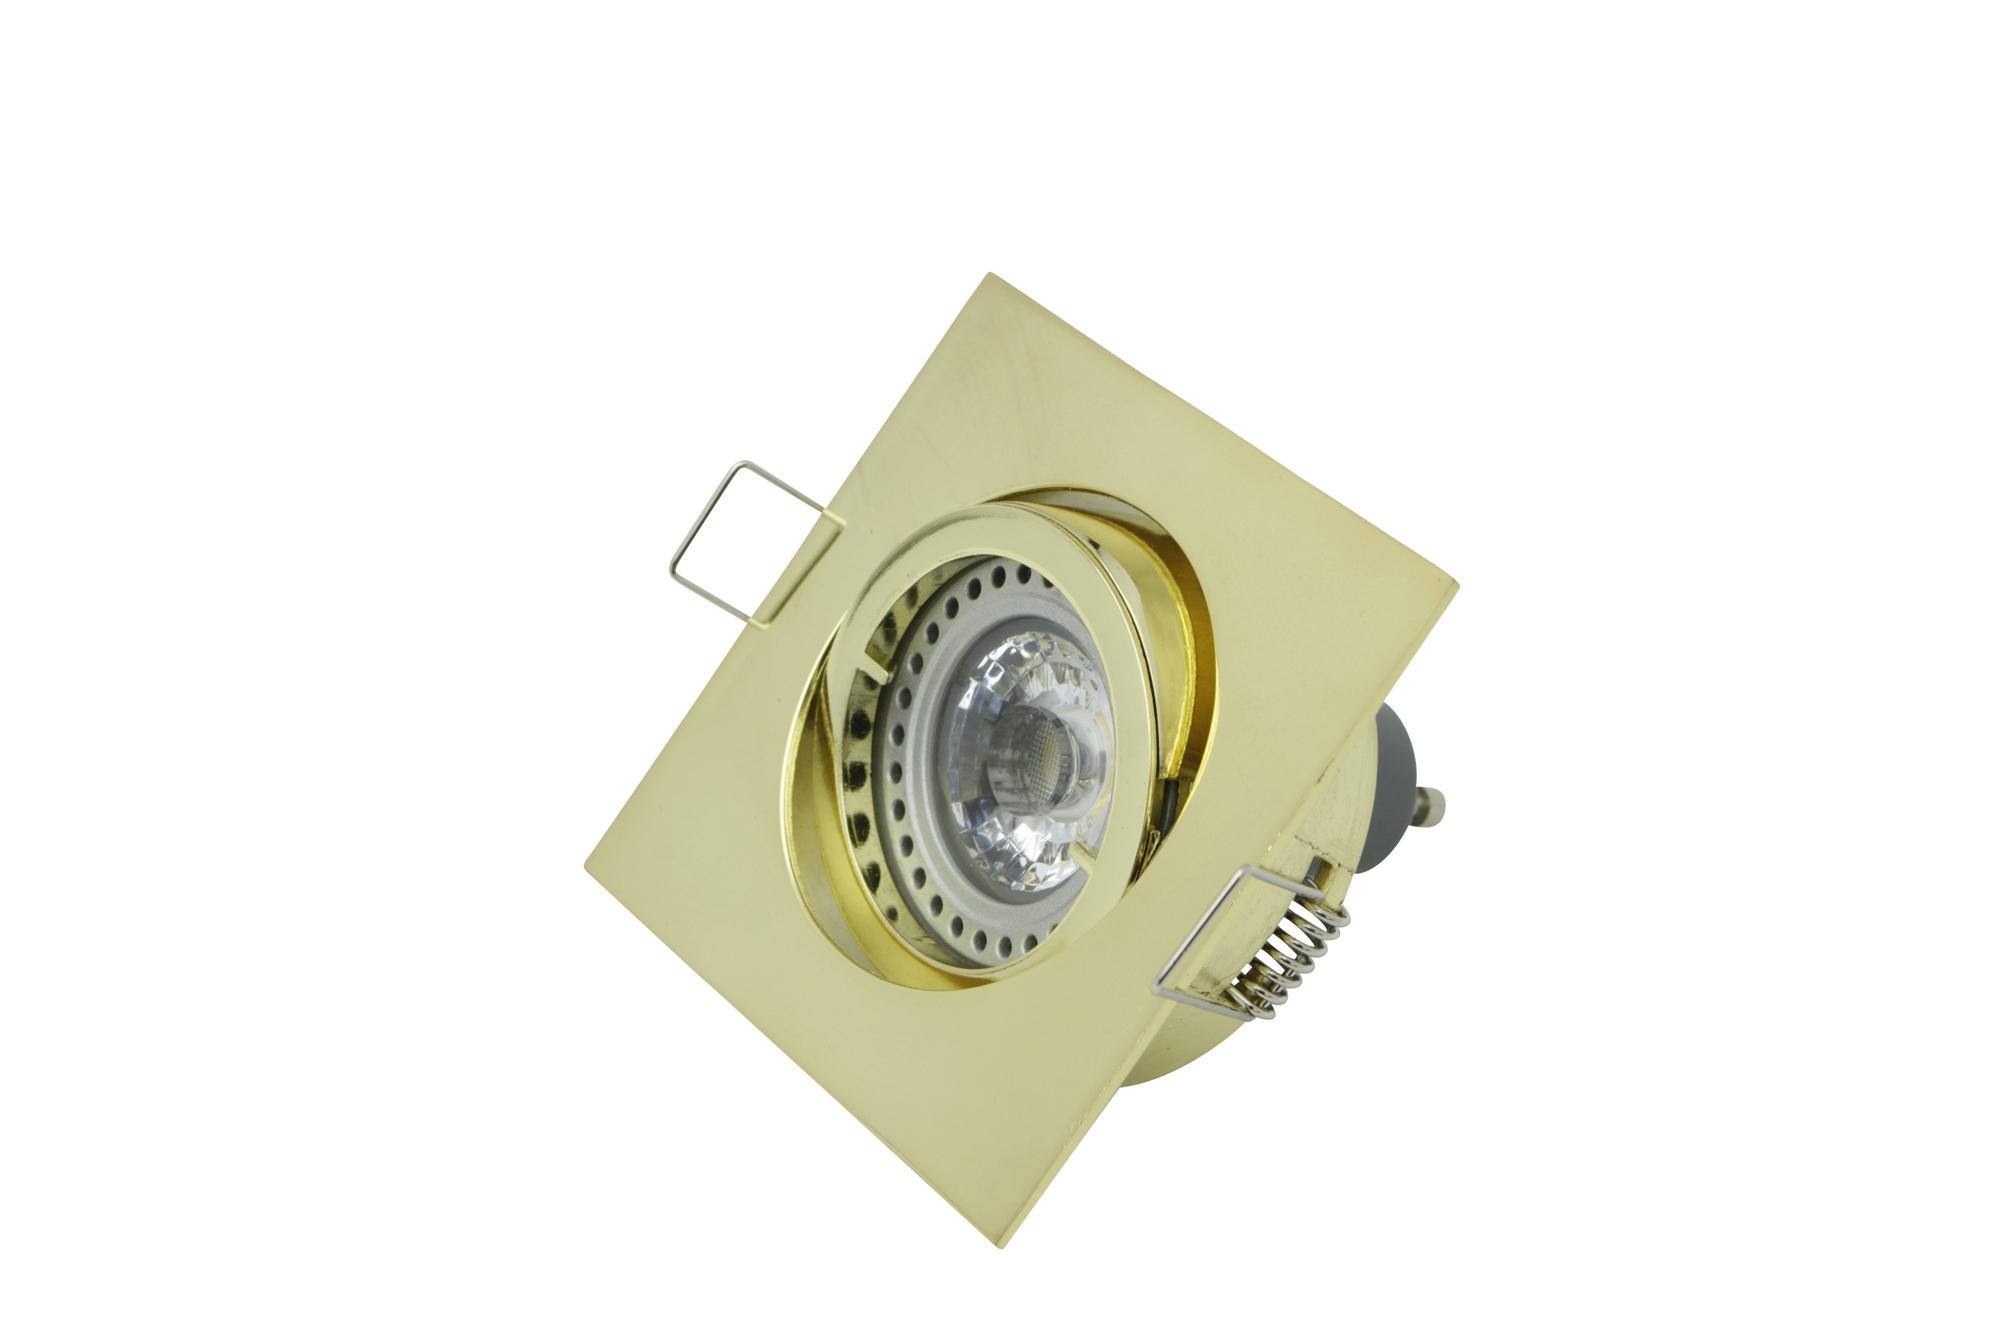 Lampenlux LED-Einbaustrahler Spot Snap eckig gold gebürstet schwenkbar 8.2x8.2cm 12V rostfrei Aluminium